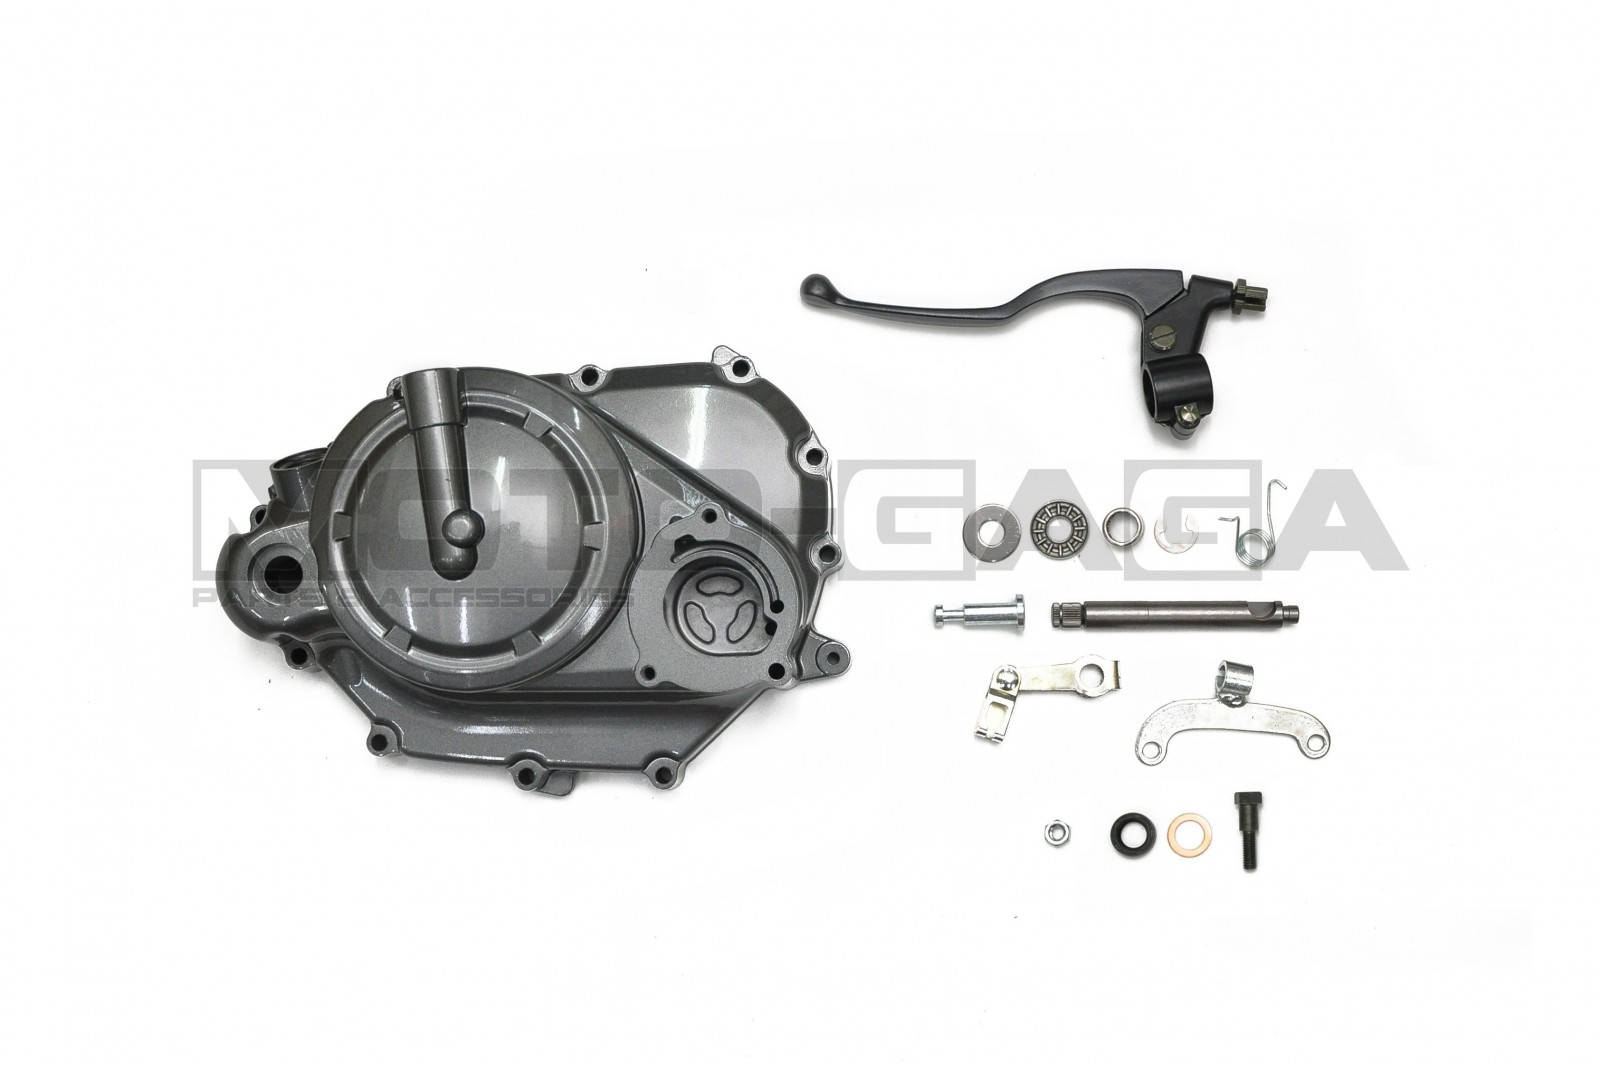 Yamaha Crypton Jupiter Vega T 115 Manual Hand Clutch Conversion Kit